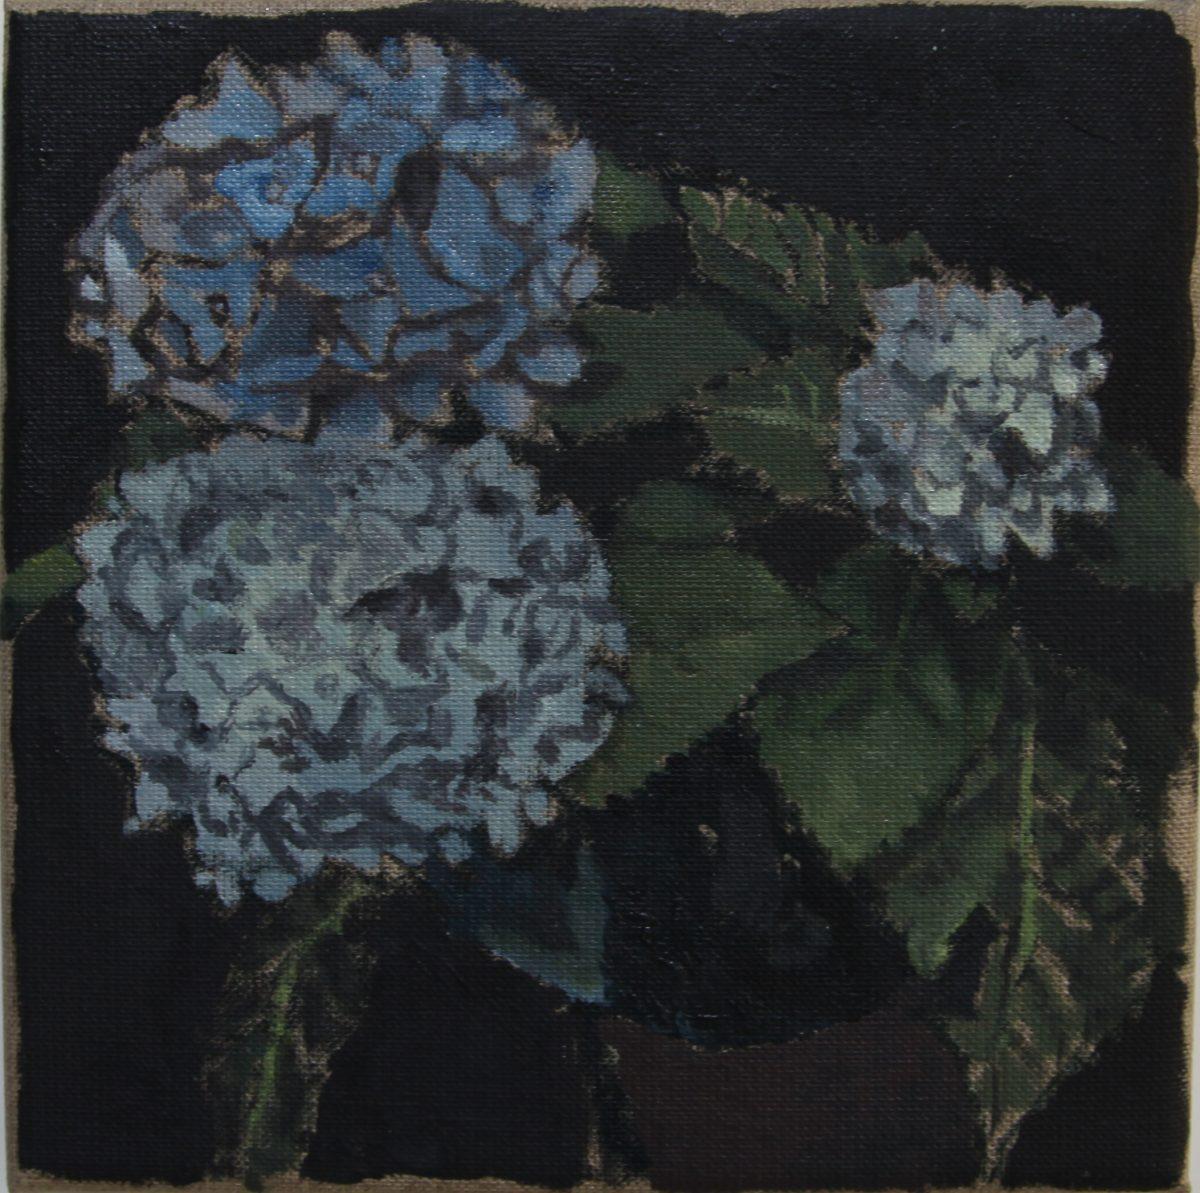 Hortensien 8, 2021, 20 x 20 cm